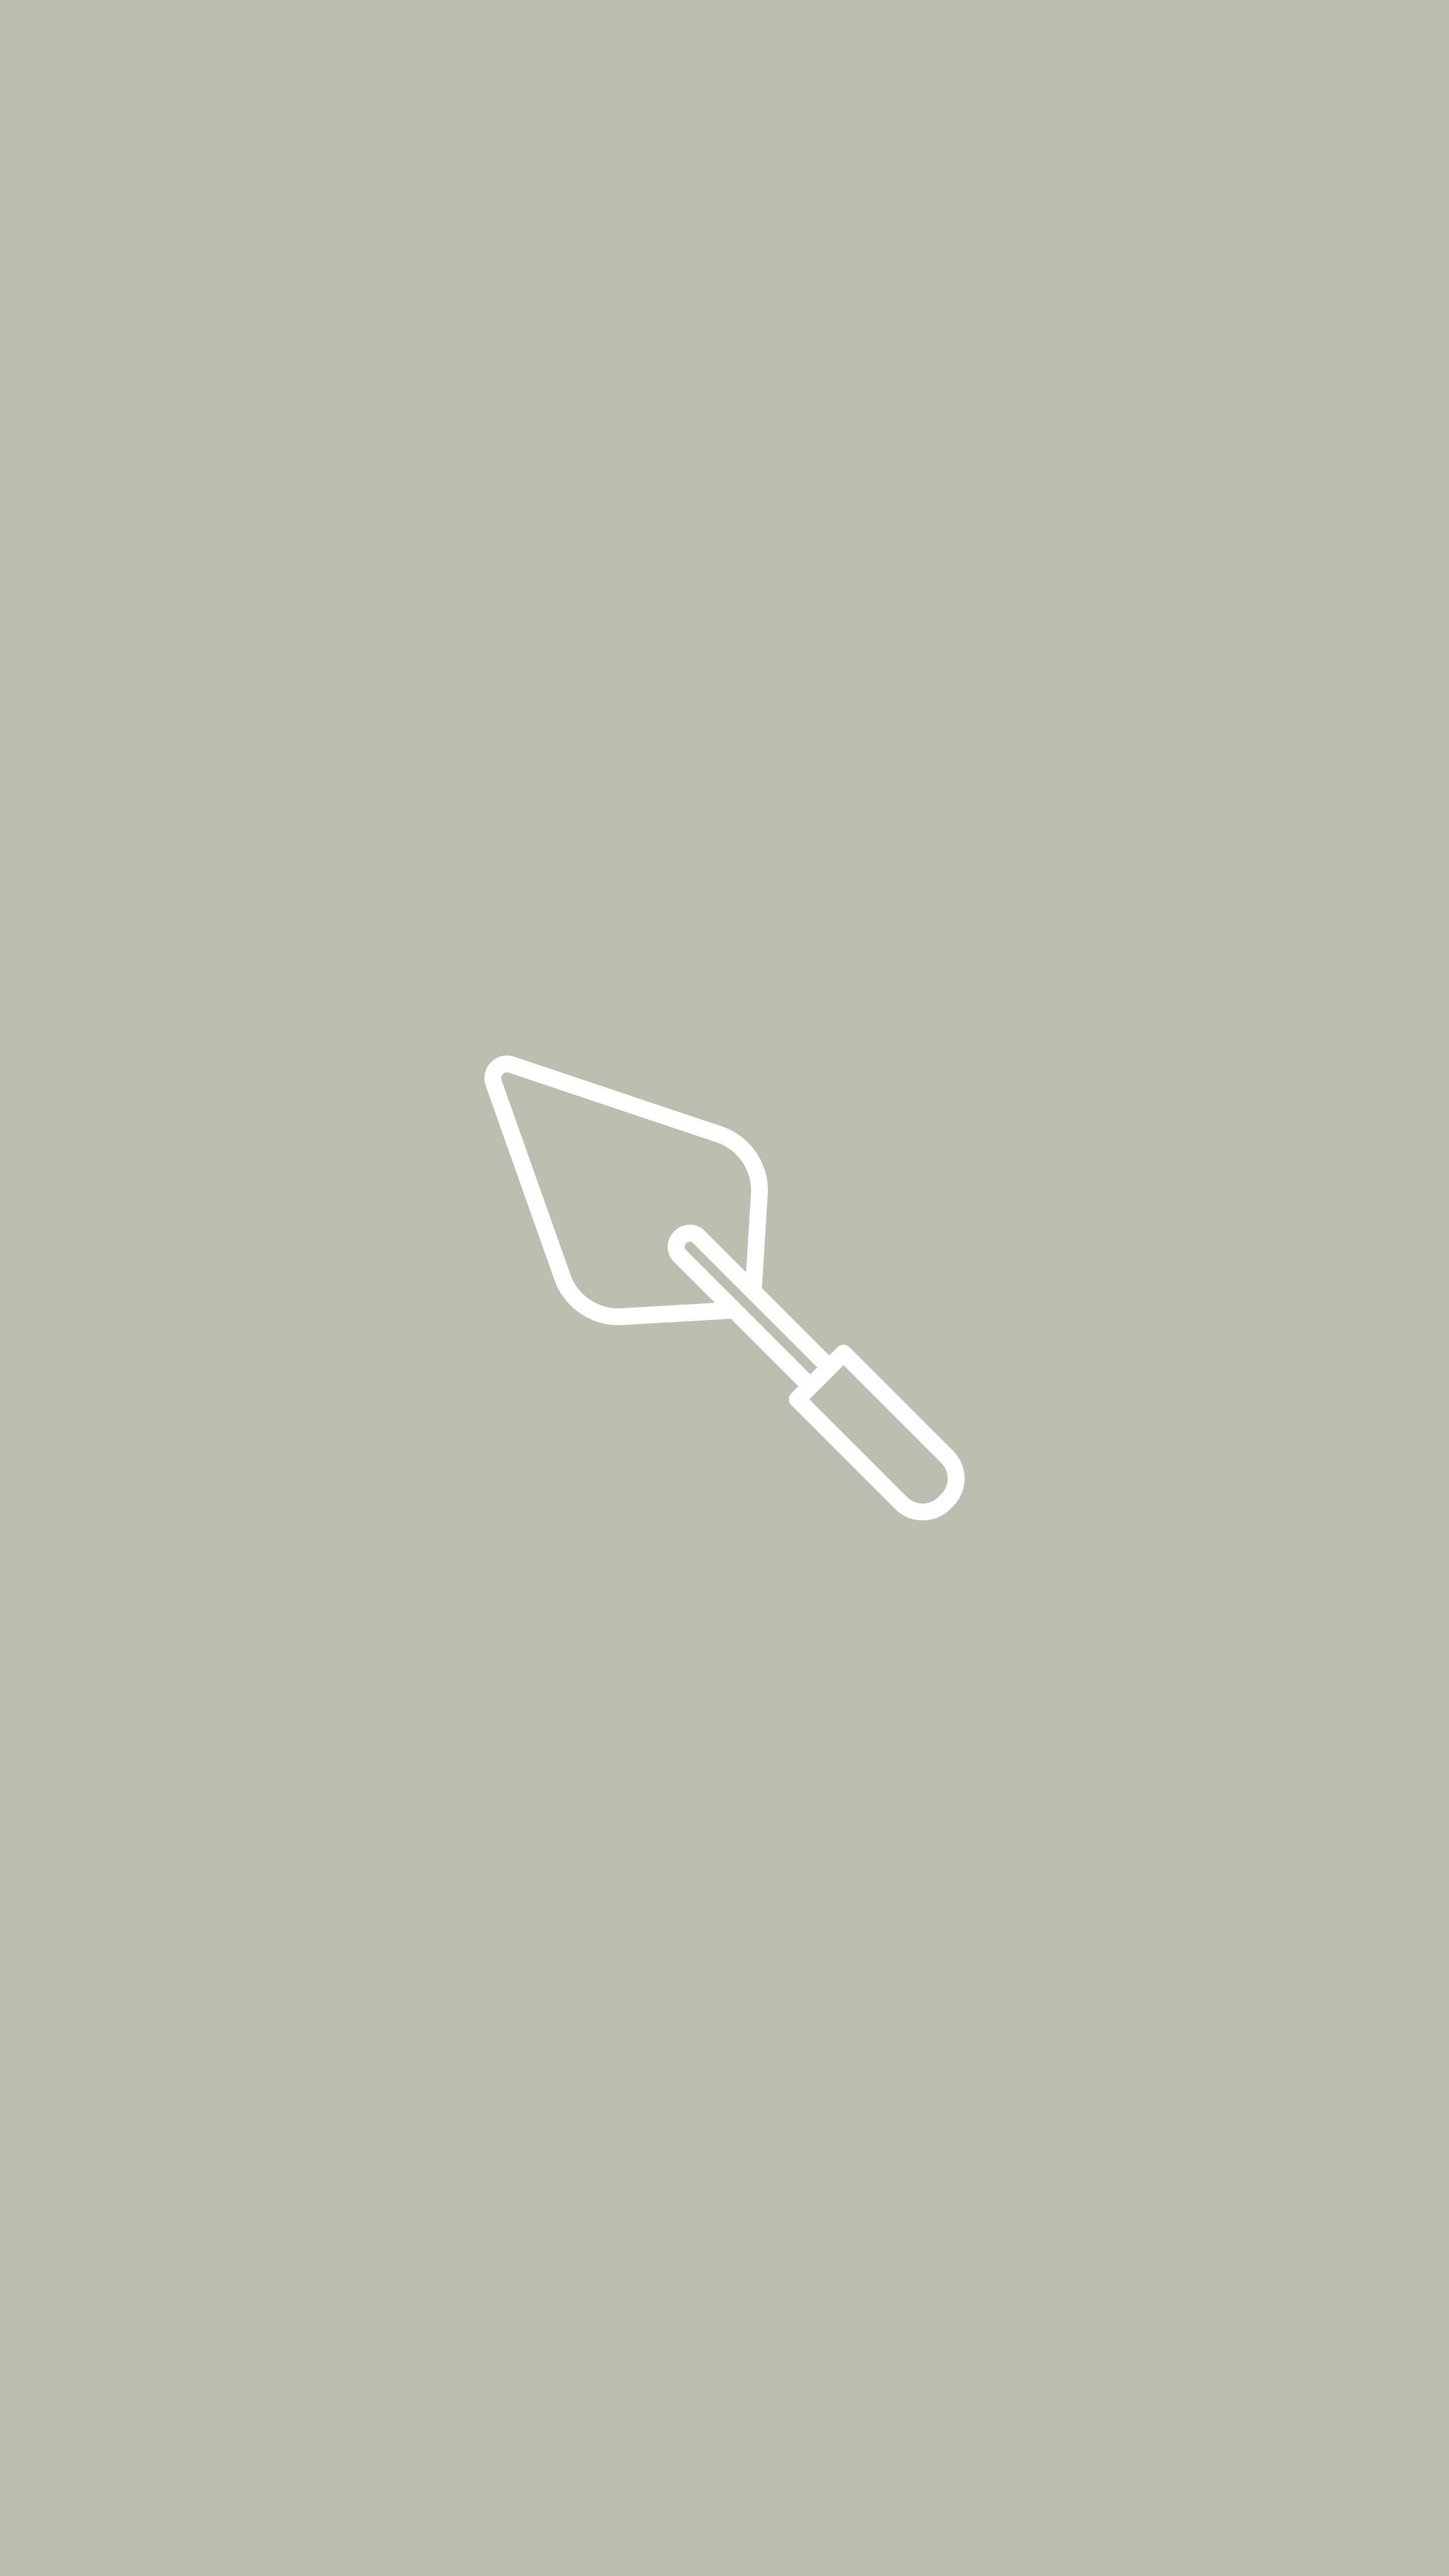 Trowel, Tiling, Gardening, DIY, Shovel